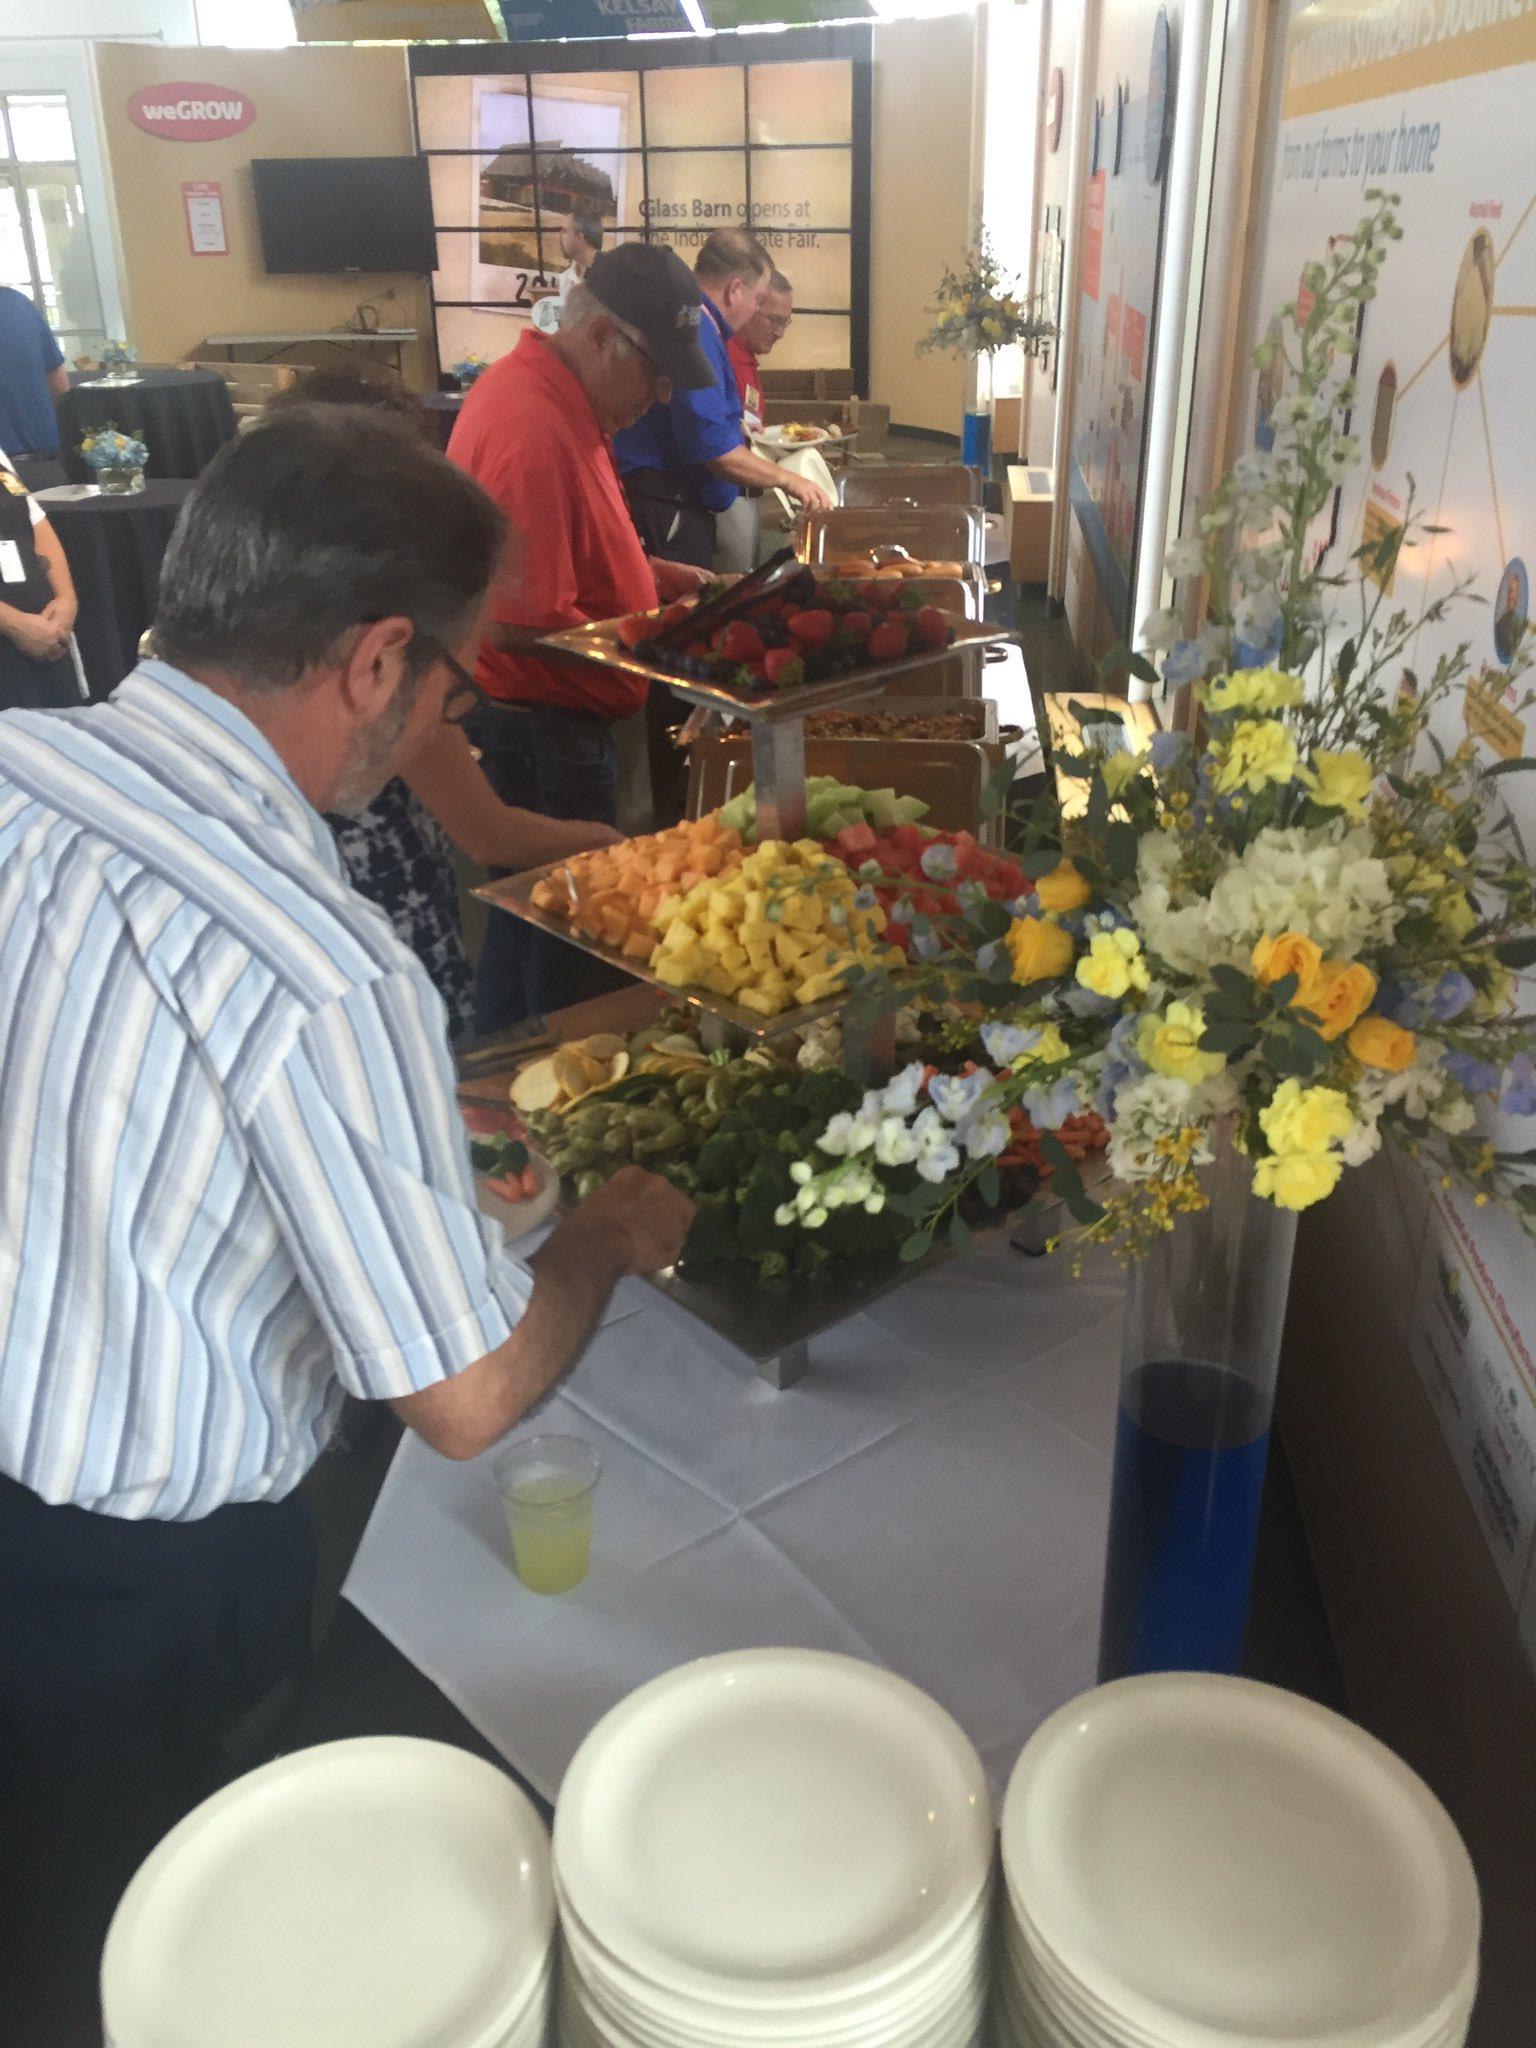 Fair food for dinner? Sounds like a celebration worthy idea! #ISA50 enter to win at https://t.co/kI2cRaTJfH https://t.co/LNZgJK8LJV